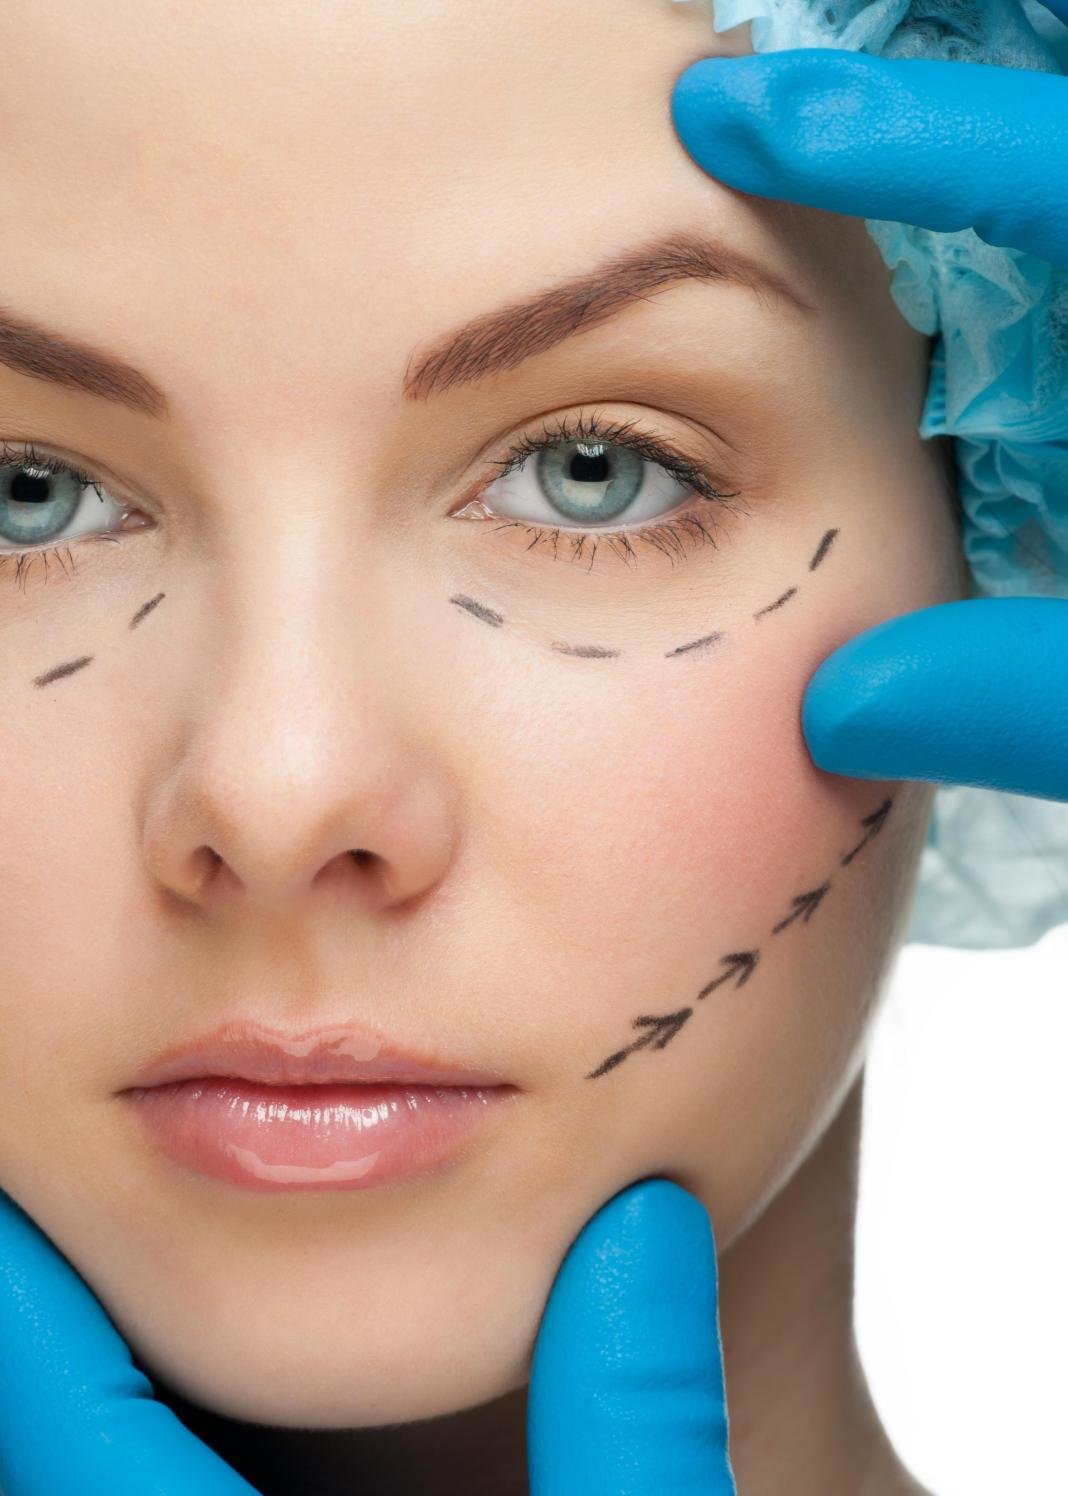 Scar Facelift Treatment